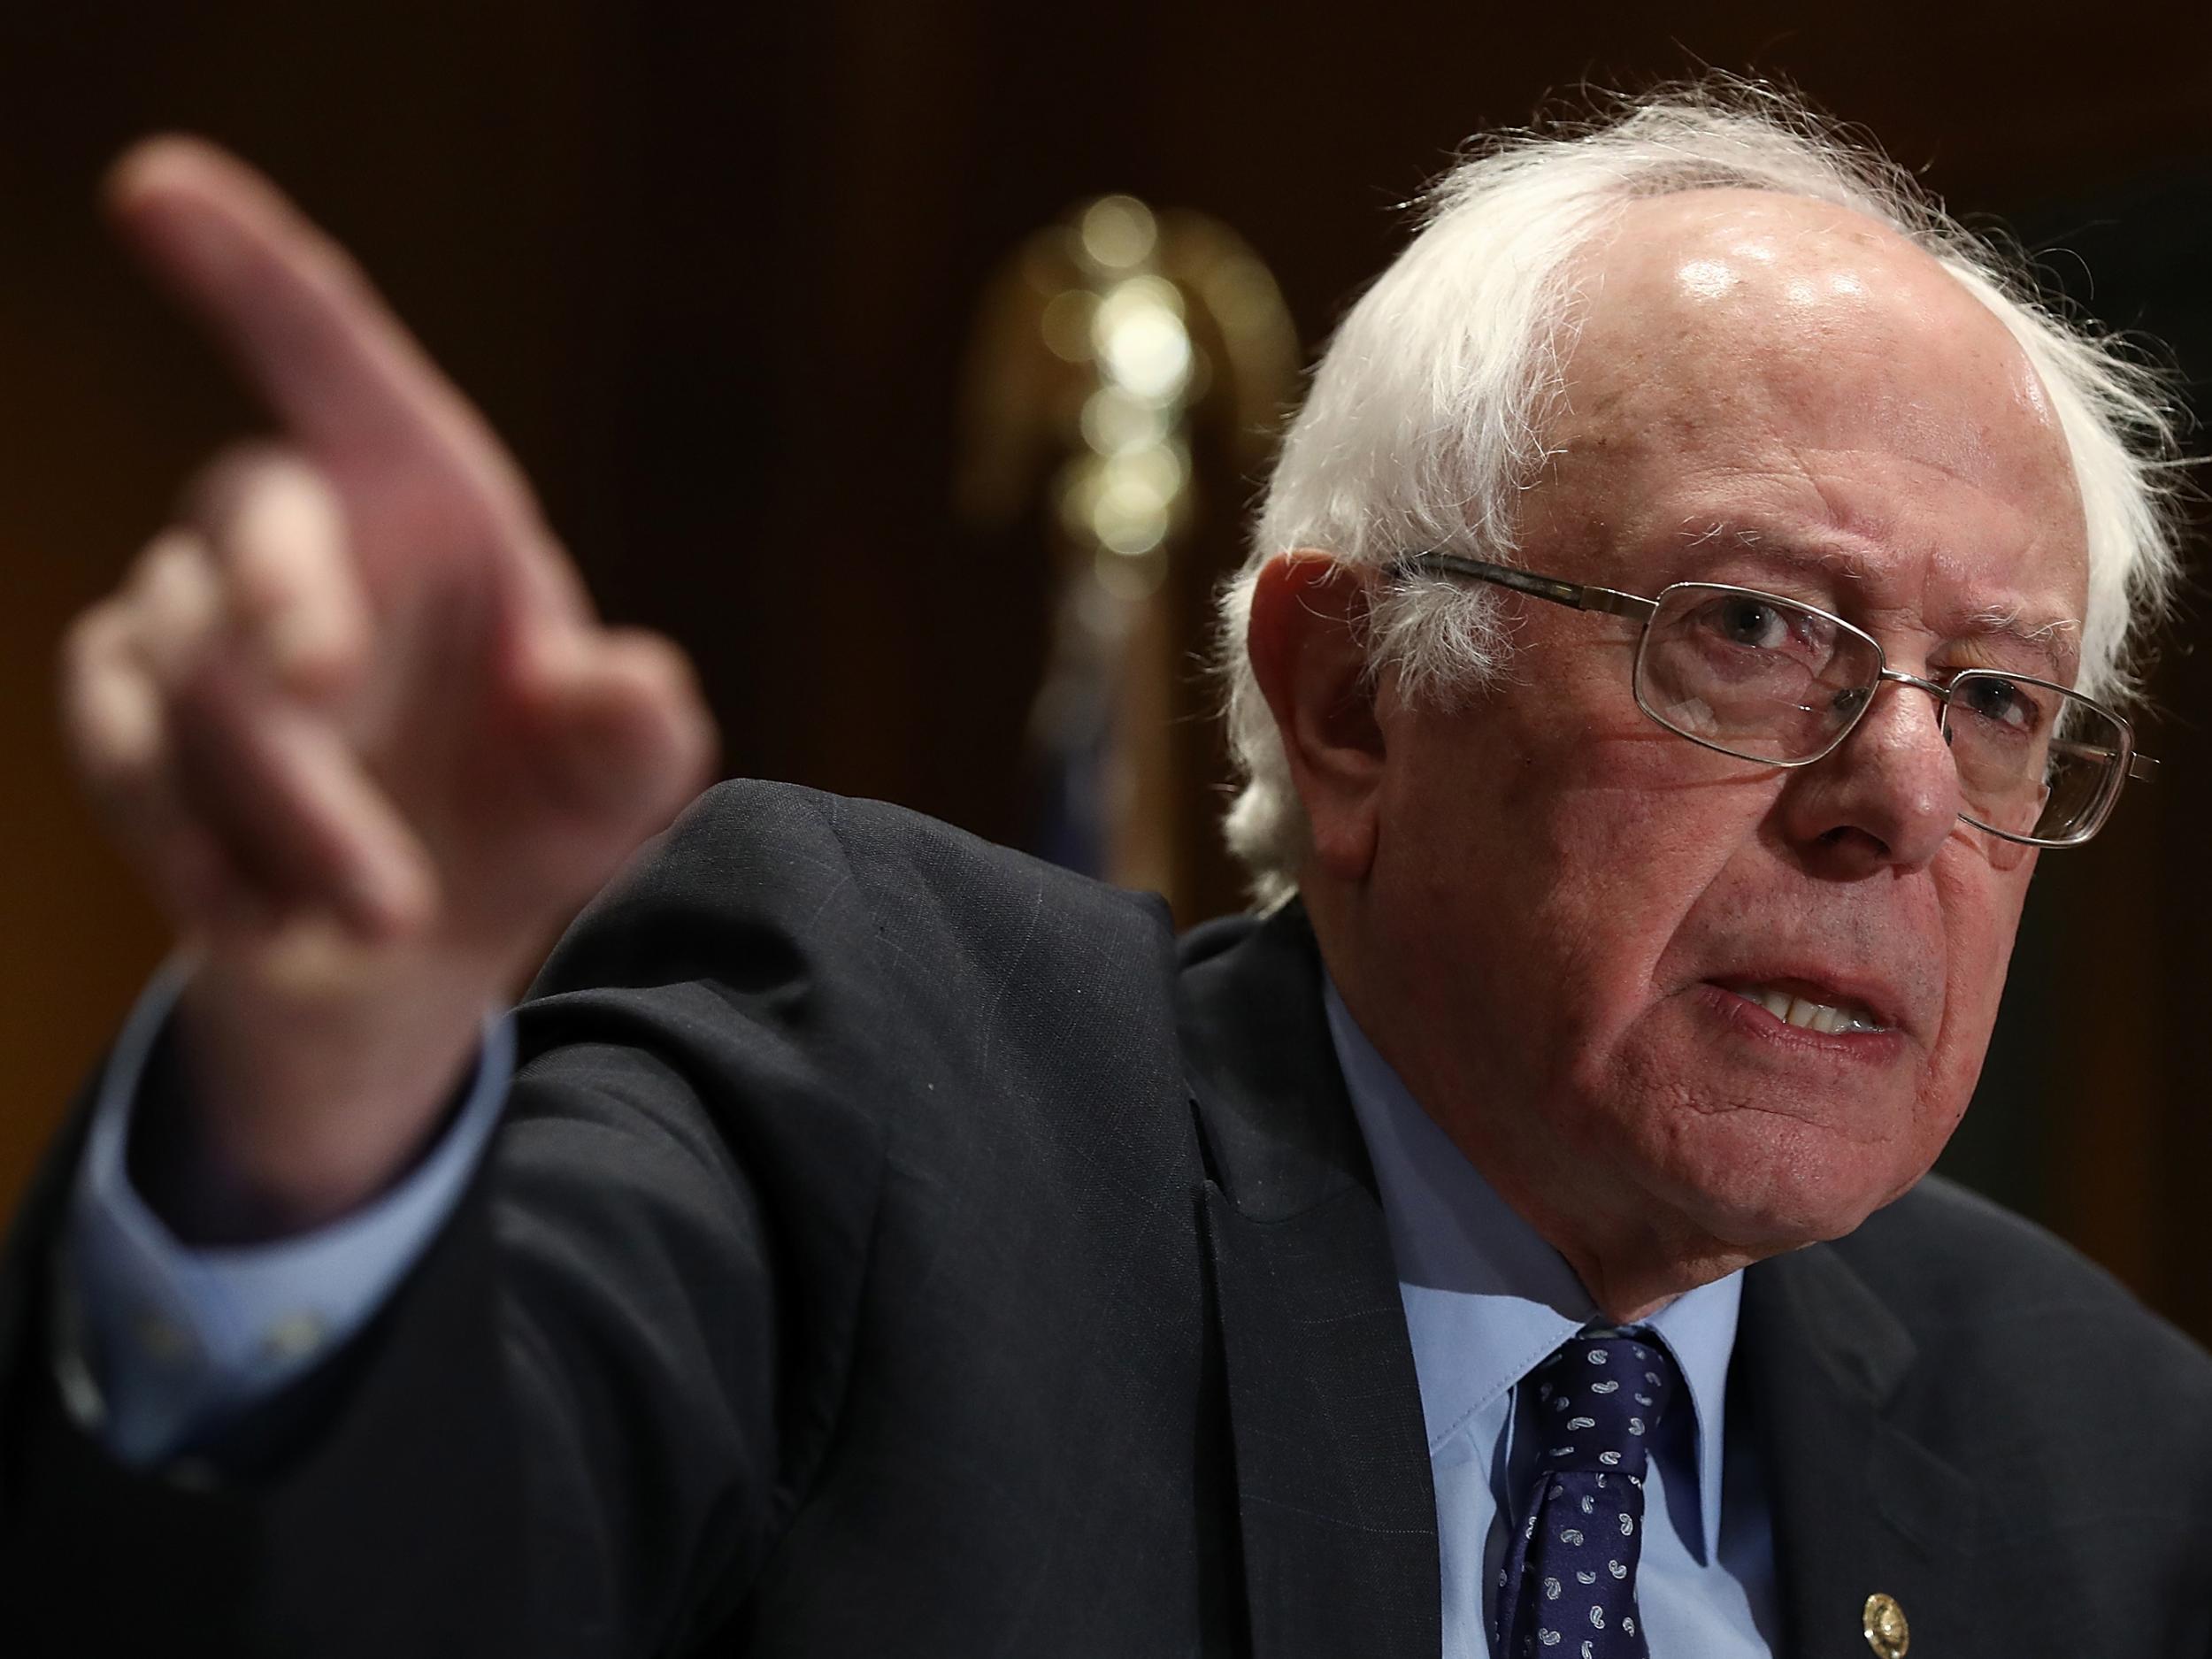 bernie sanders responds to 2020 presidential bid question with